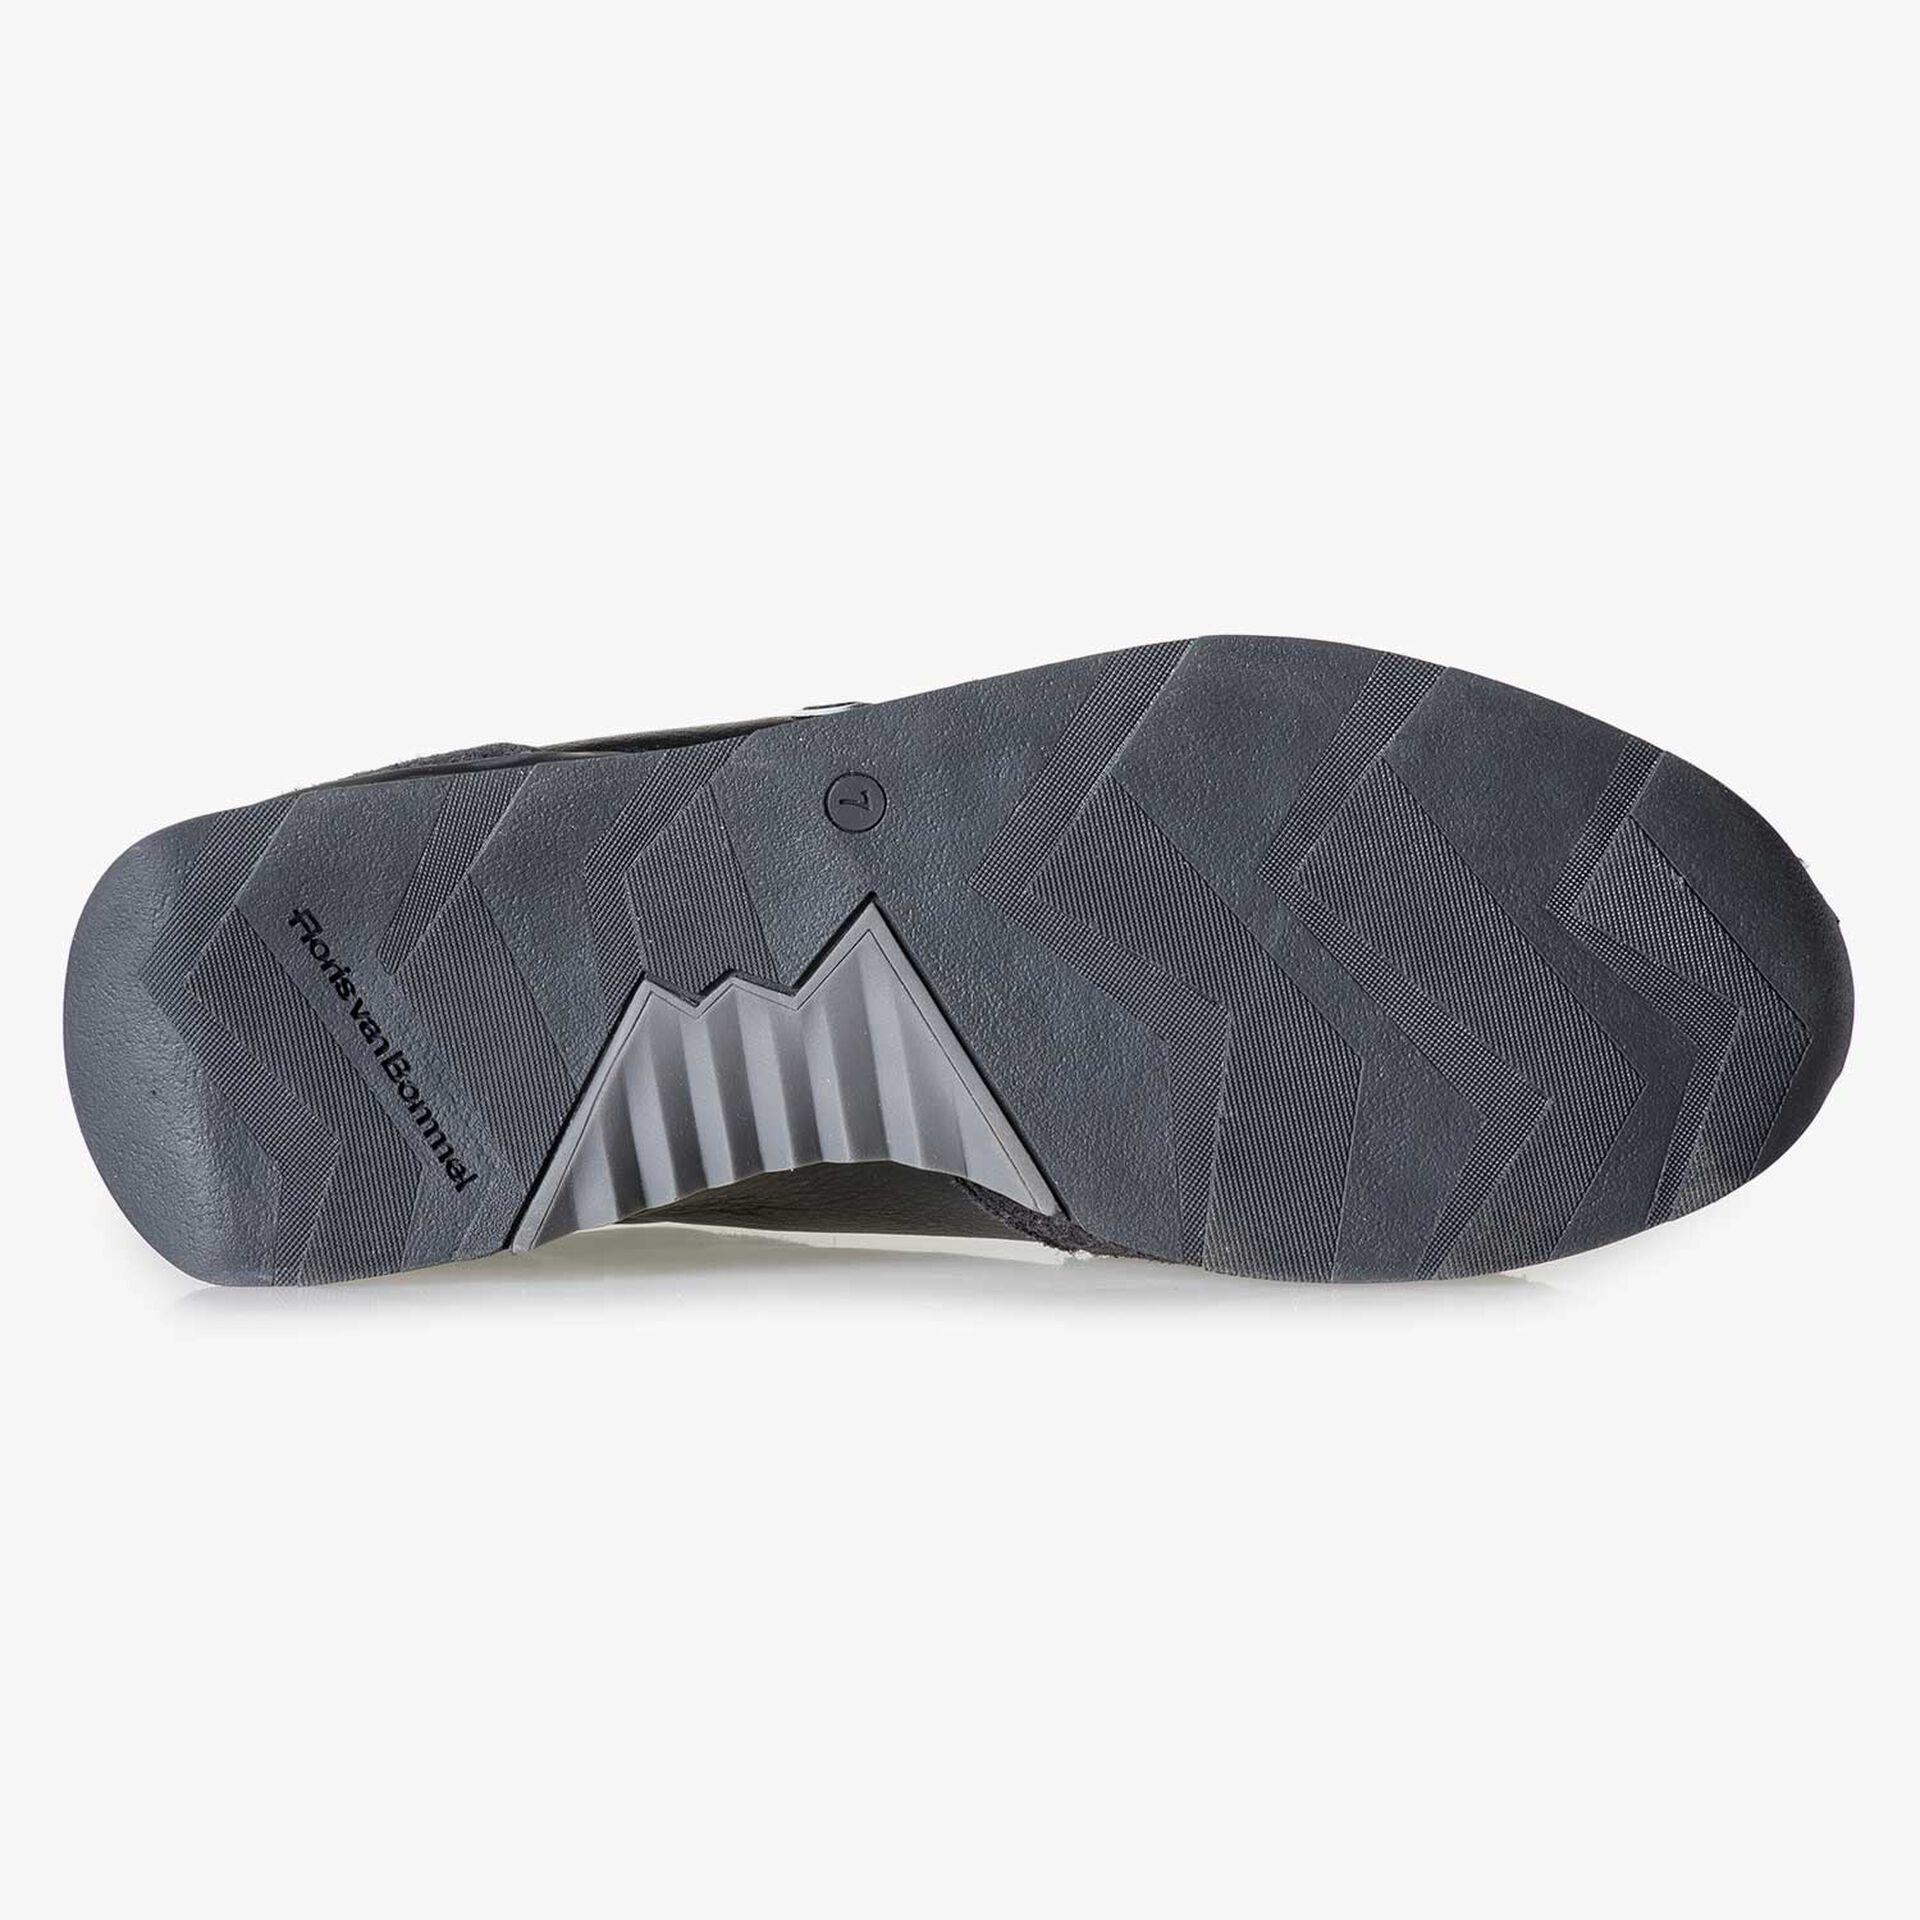 Black calf leather sneaker